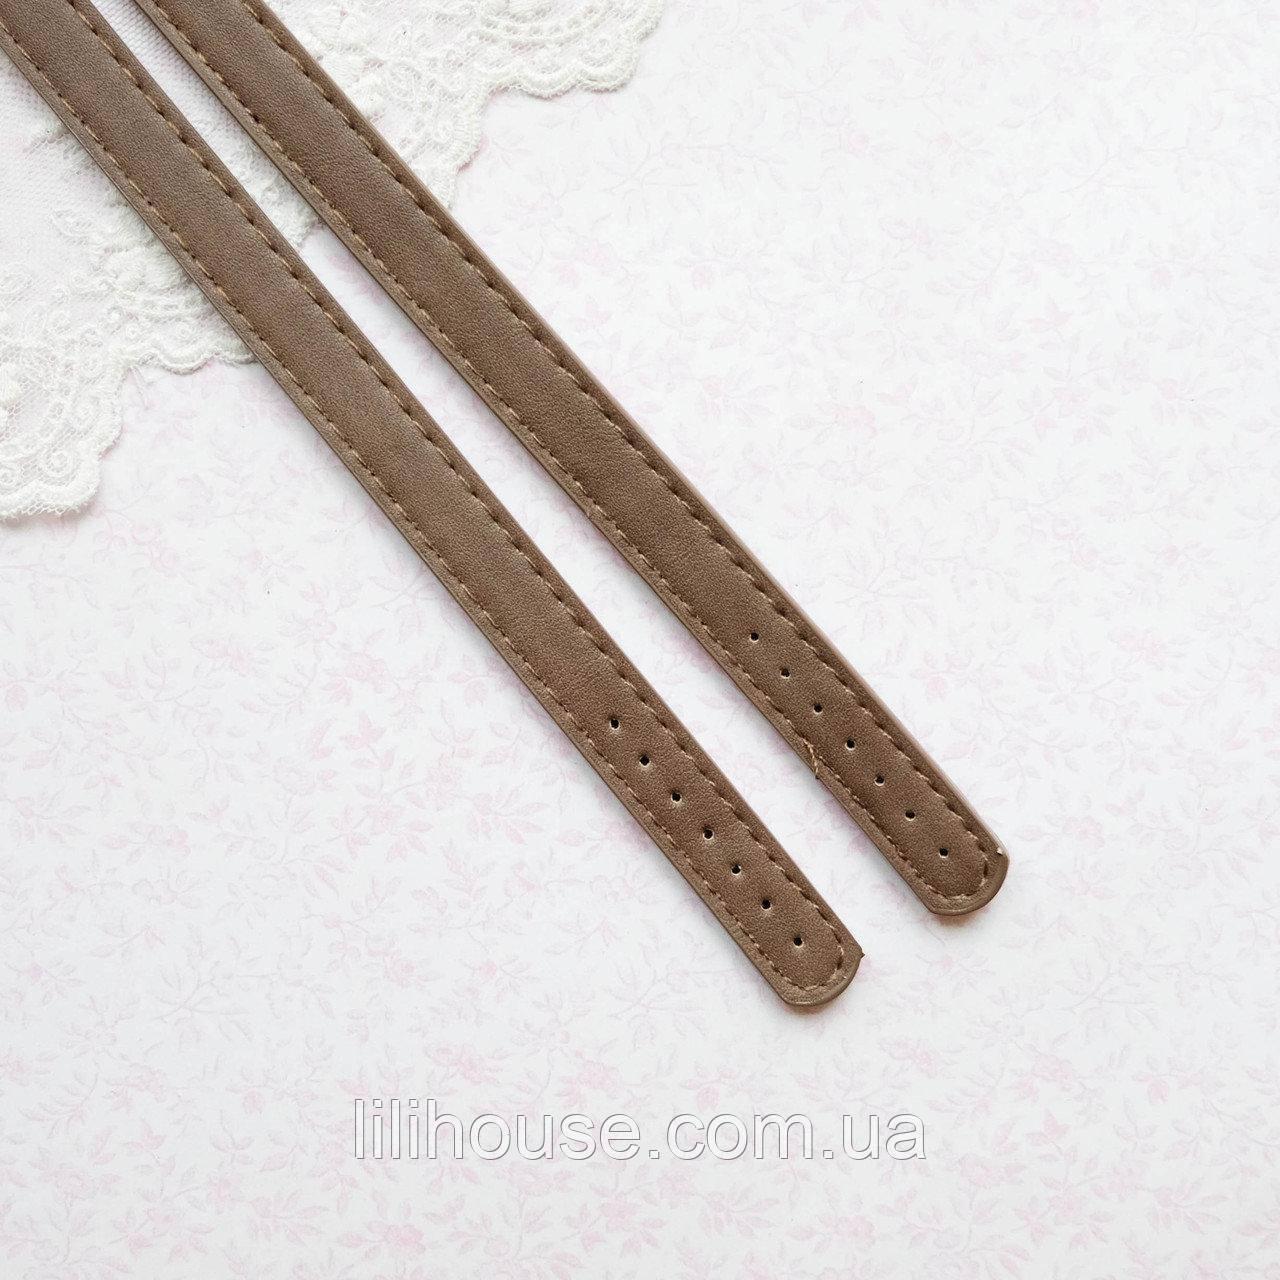 Ручки для Сумки 65 см пара 1.4 см Мокко